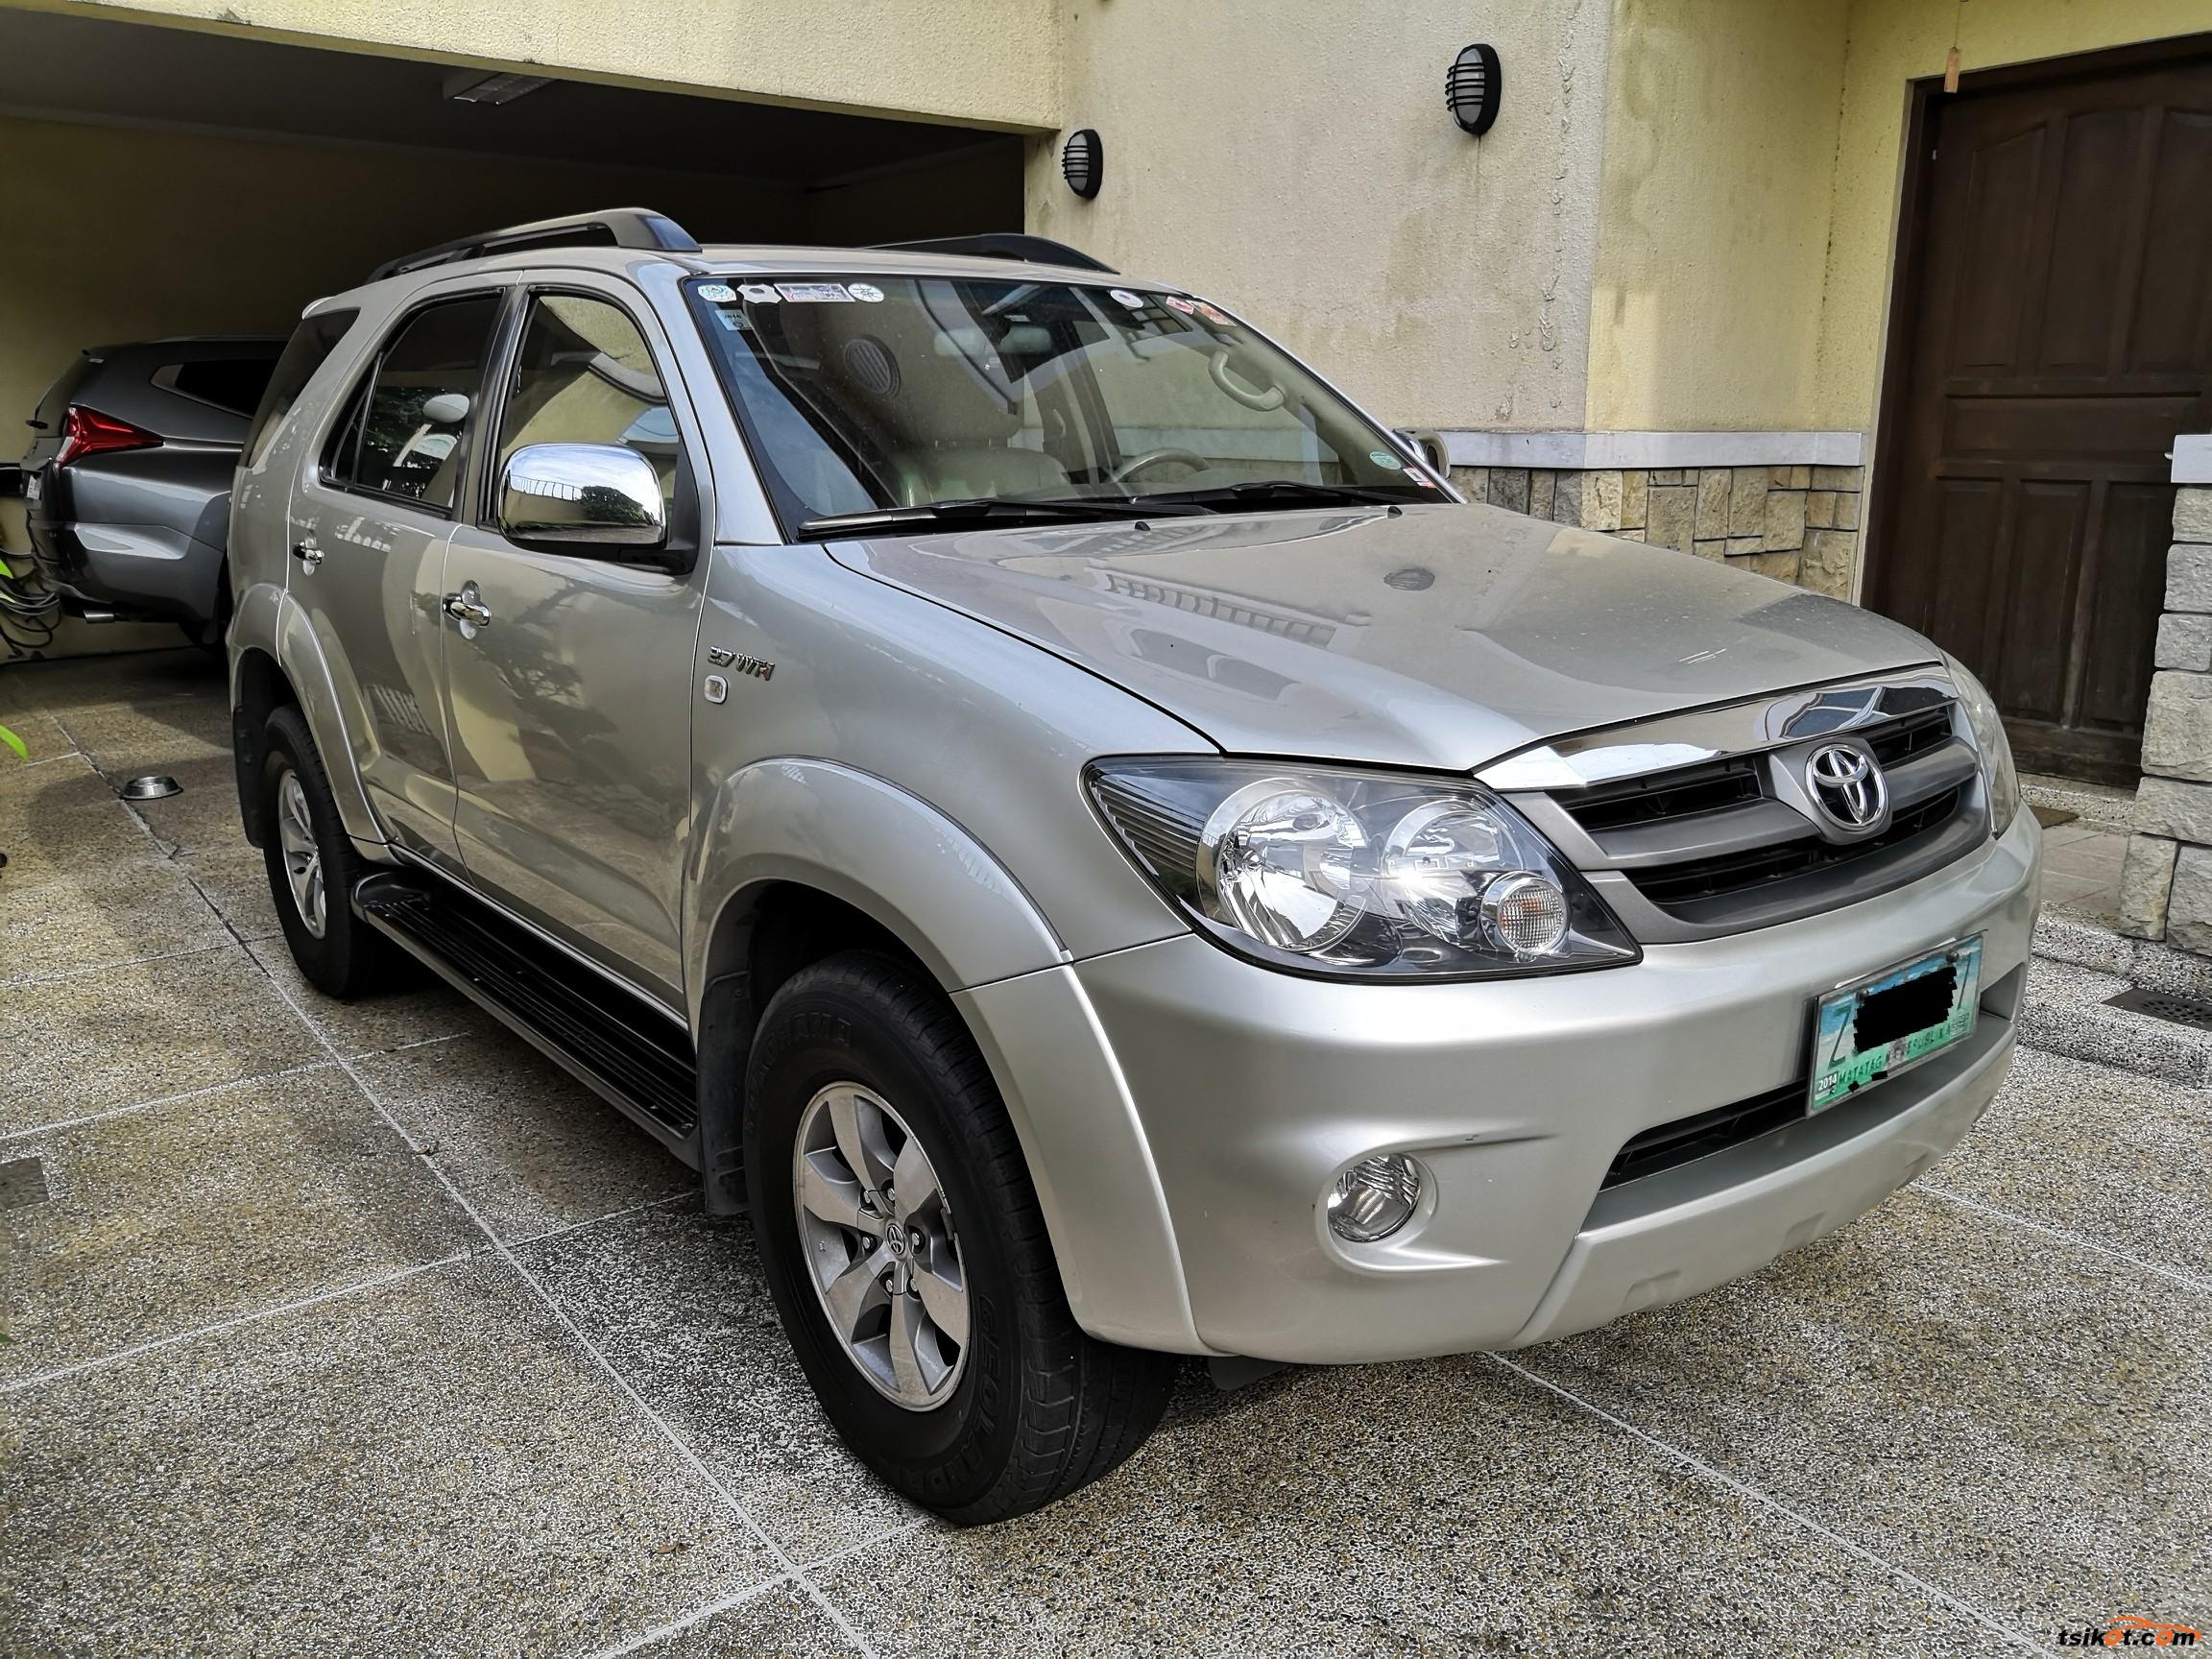 Toyota Fortuner 2008 - 1